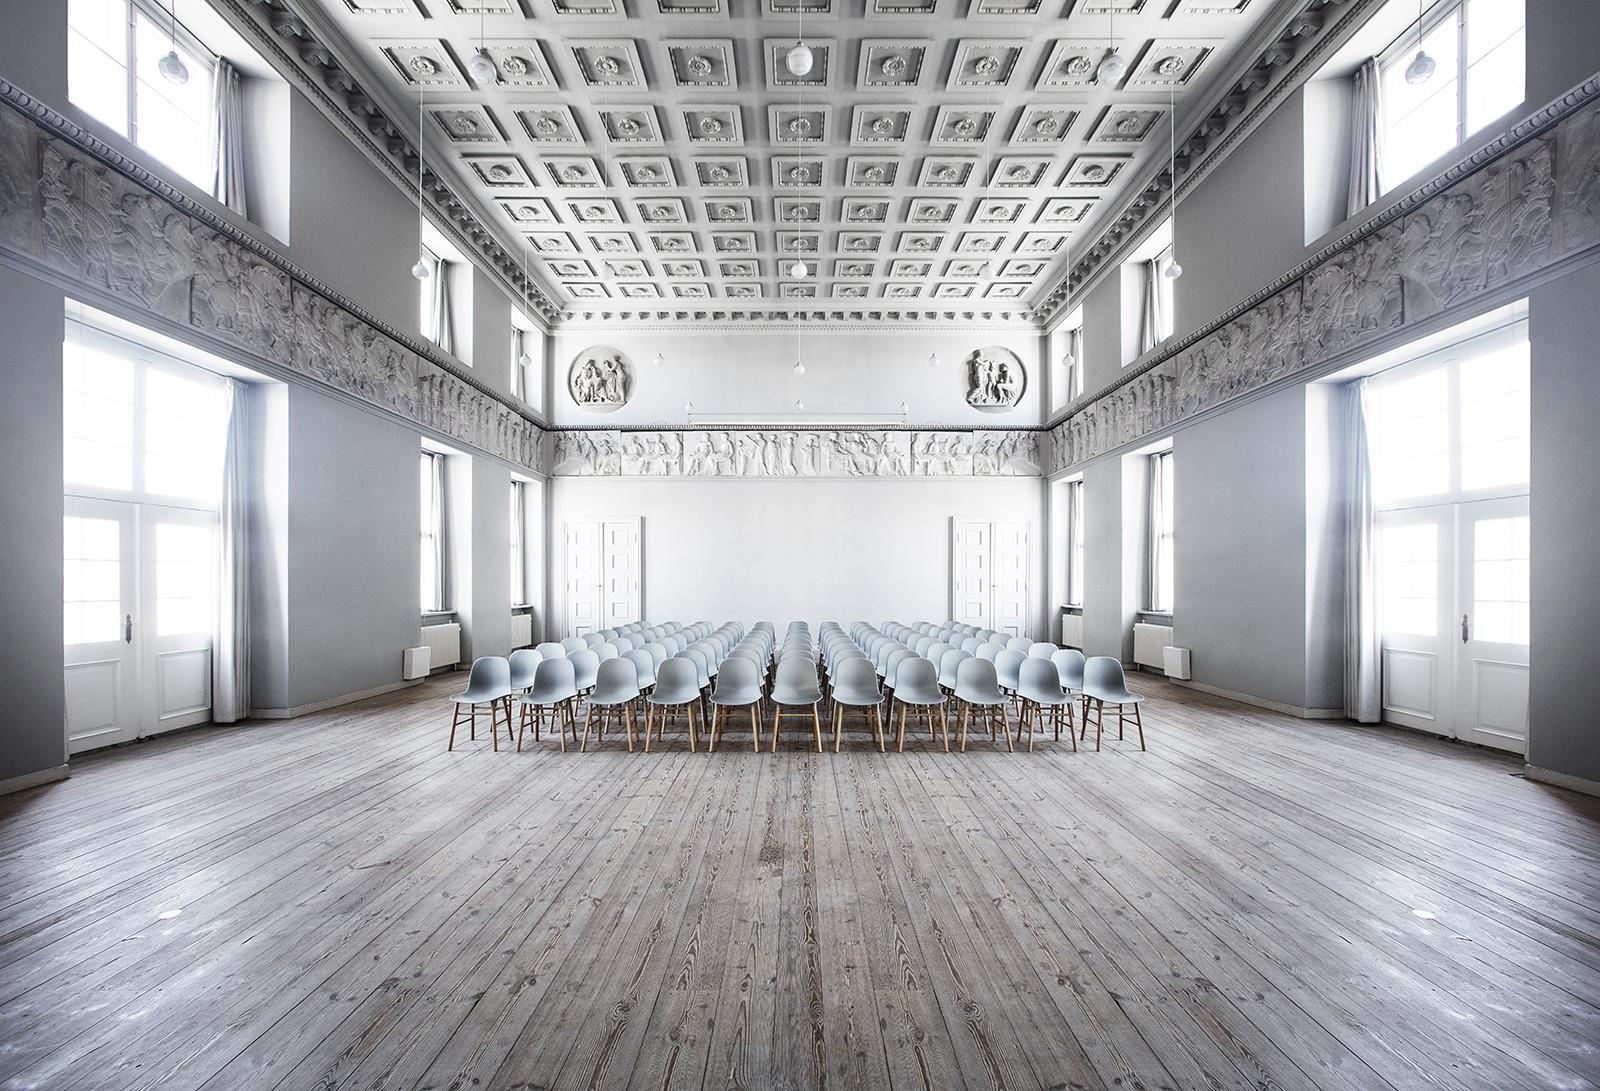 Meeting Space At Kunsthal Charlottenborg